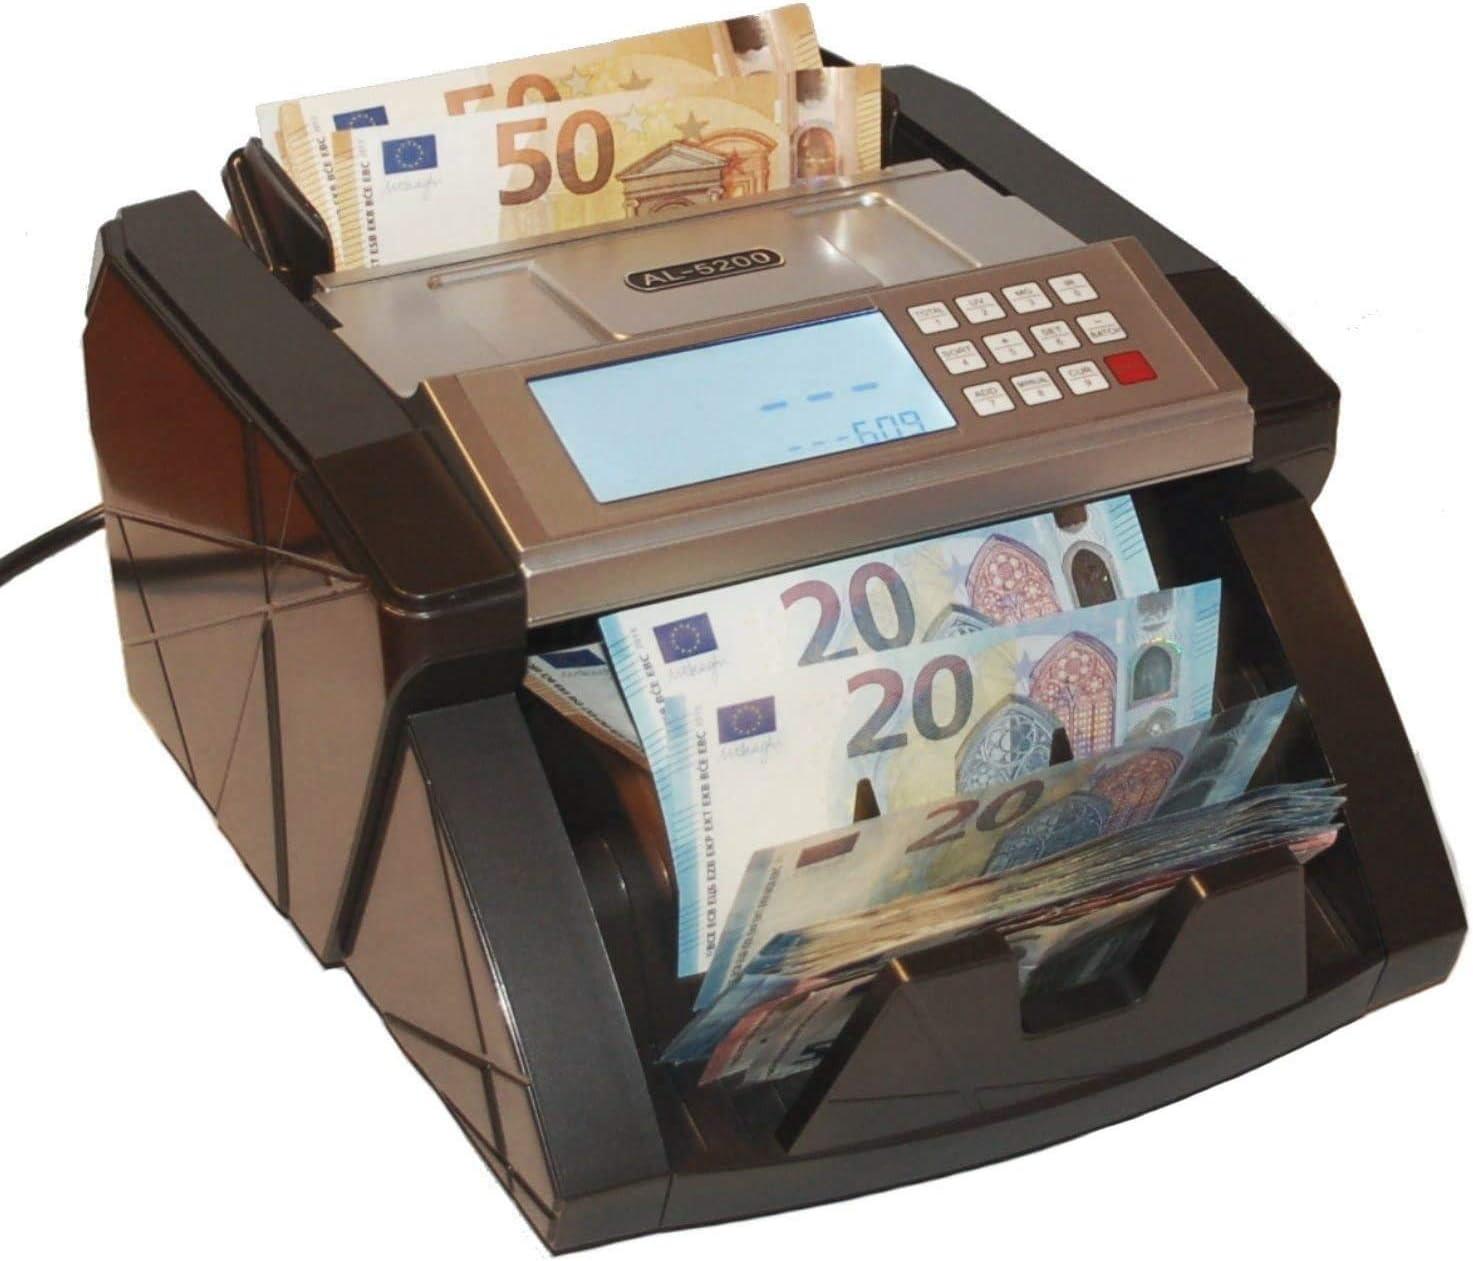 Compteur de billets de banque